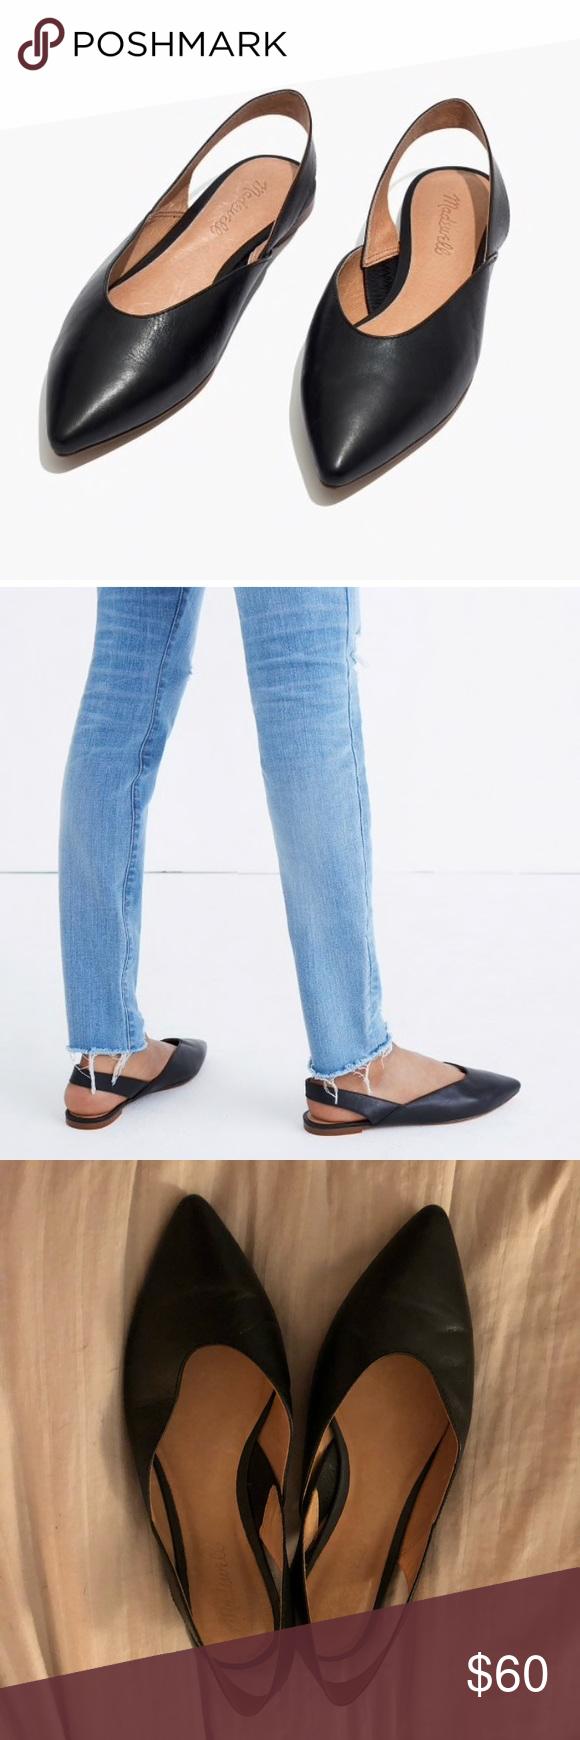 Madewell Ava Slingback Flat Leather